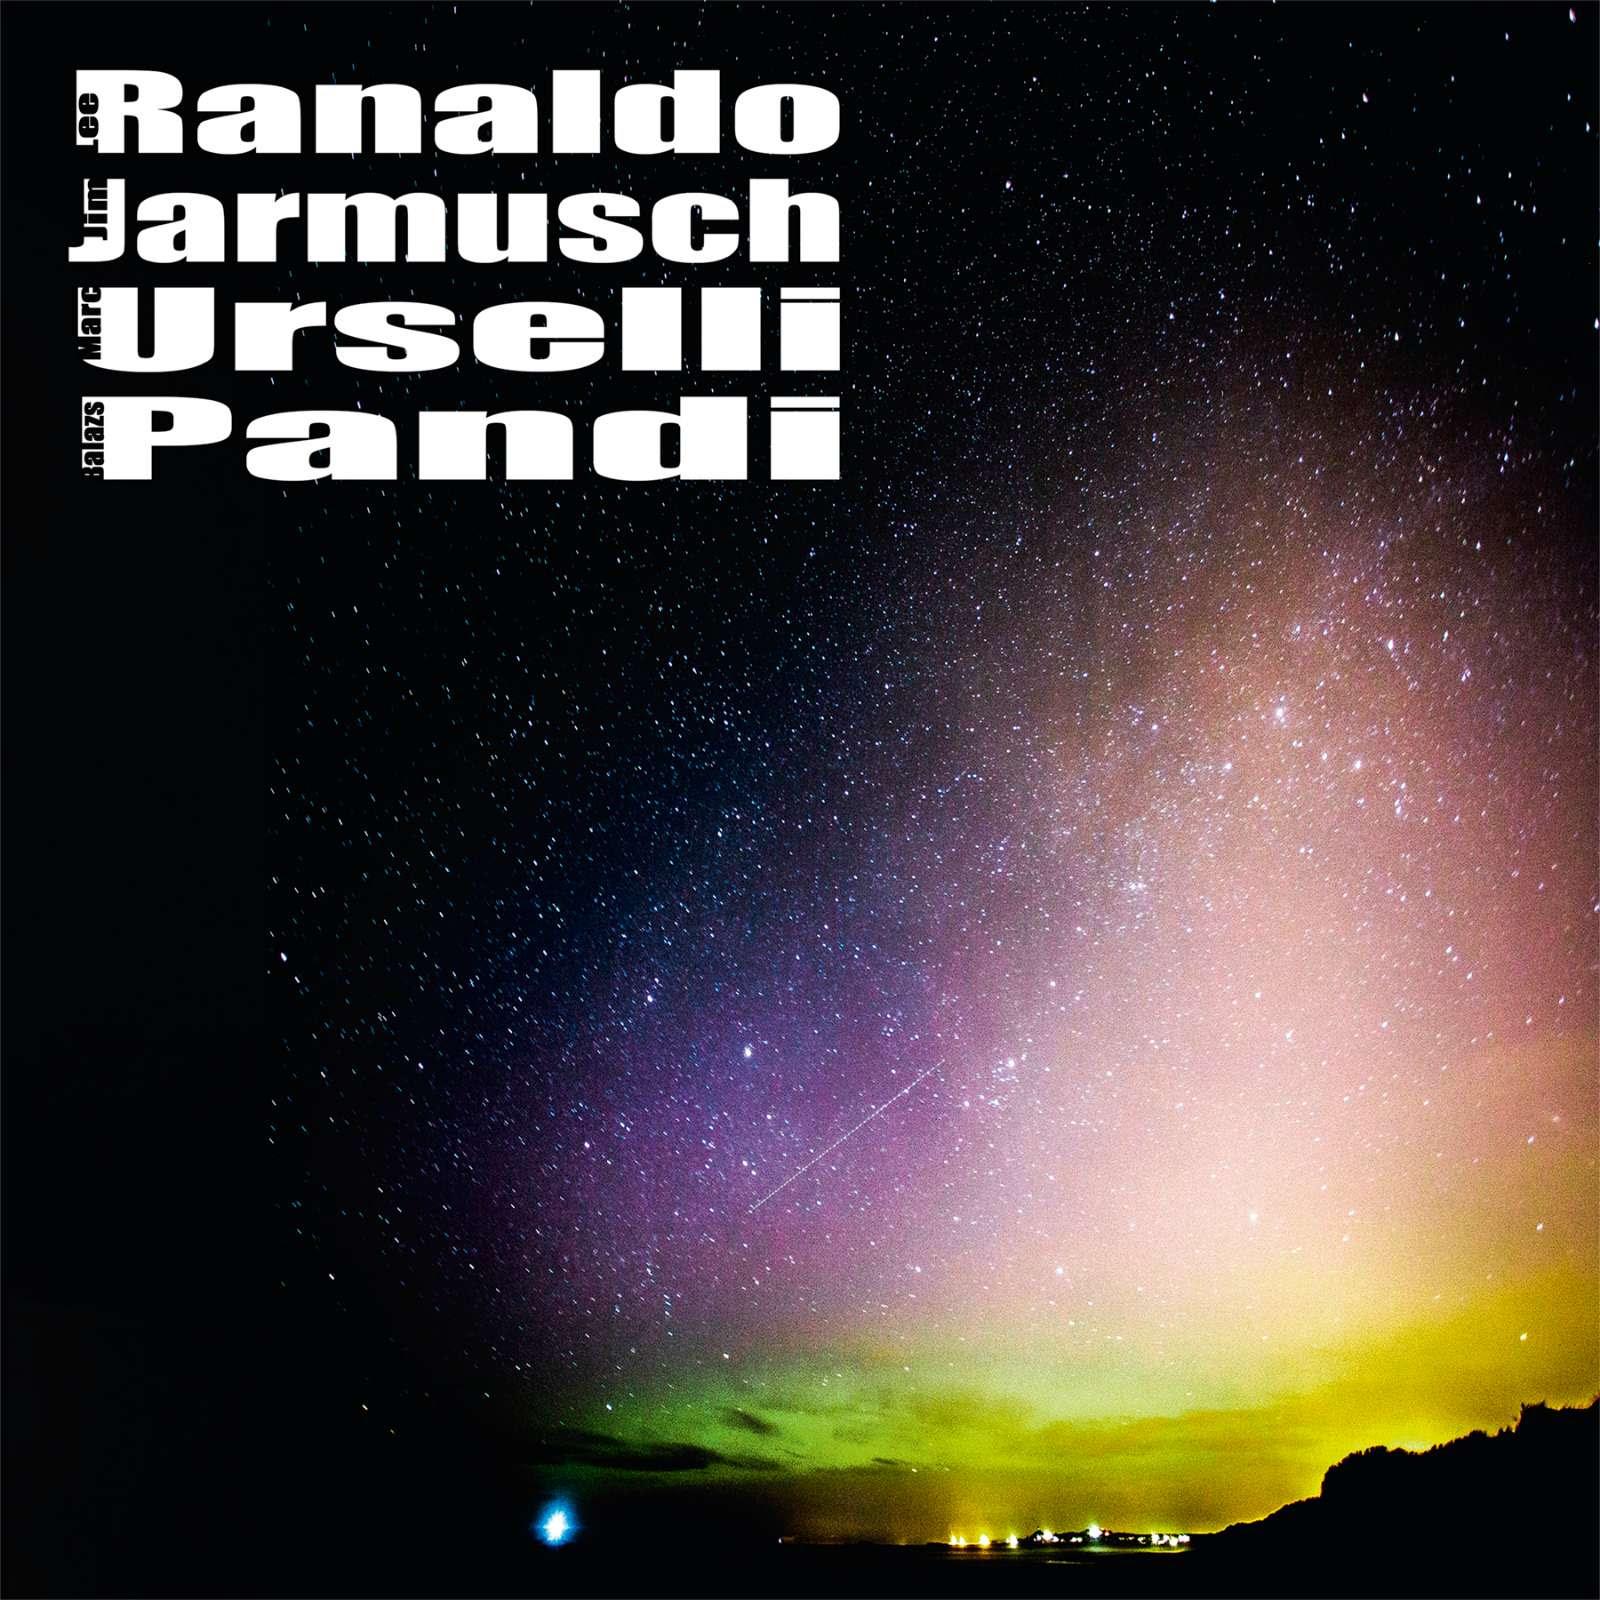 Lee Ranaldo/Jim Jarmusch/ Marc Urselli/Balazs Pandi, Album Artwork